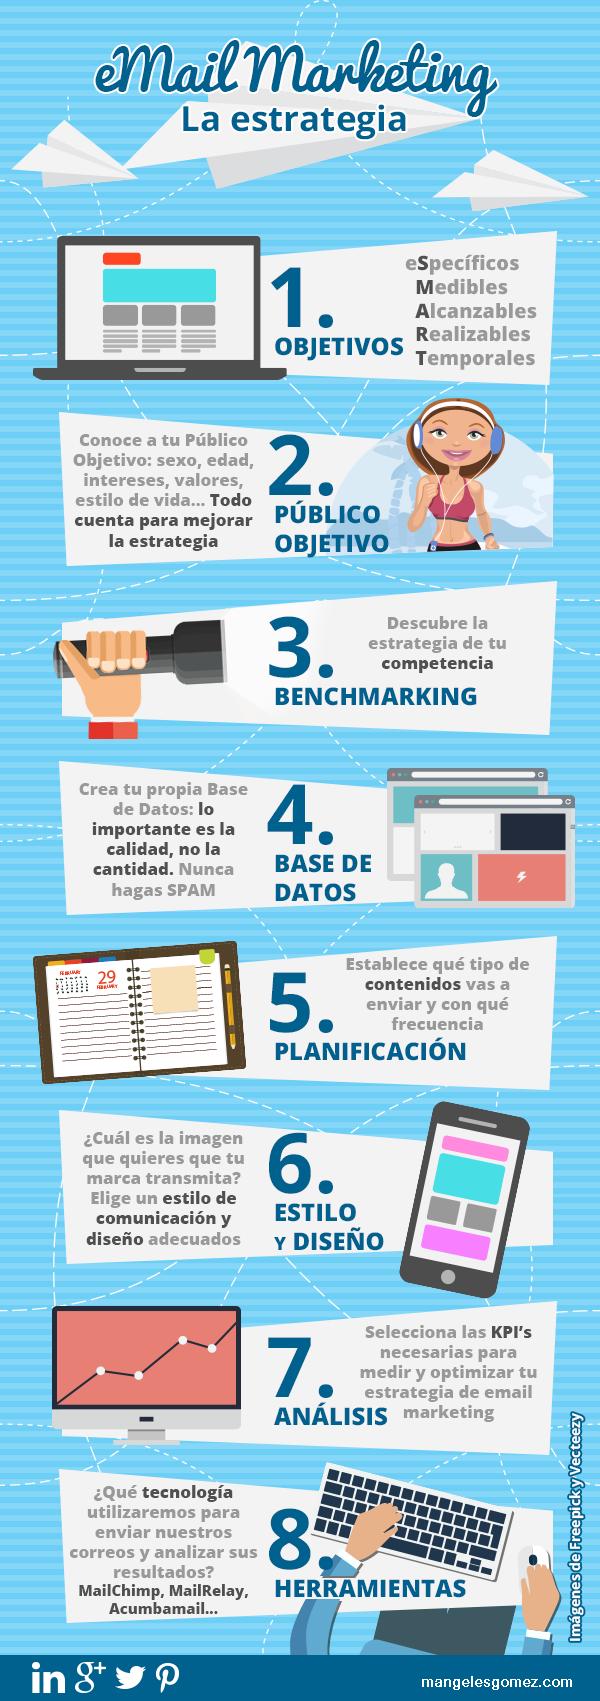 eMail Marketing: la estrategia